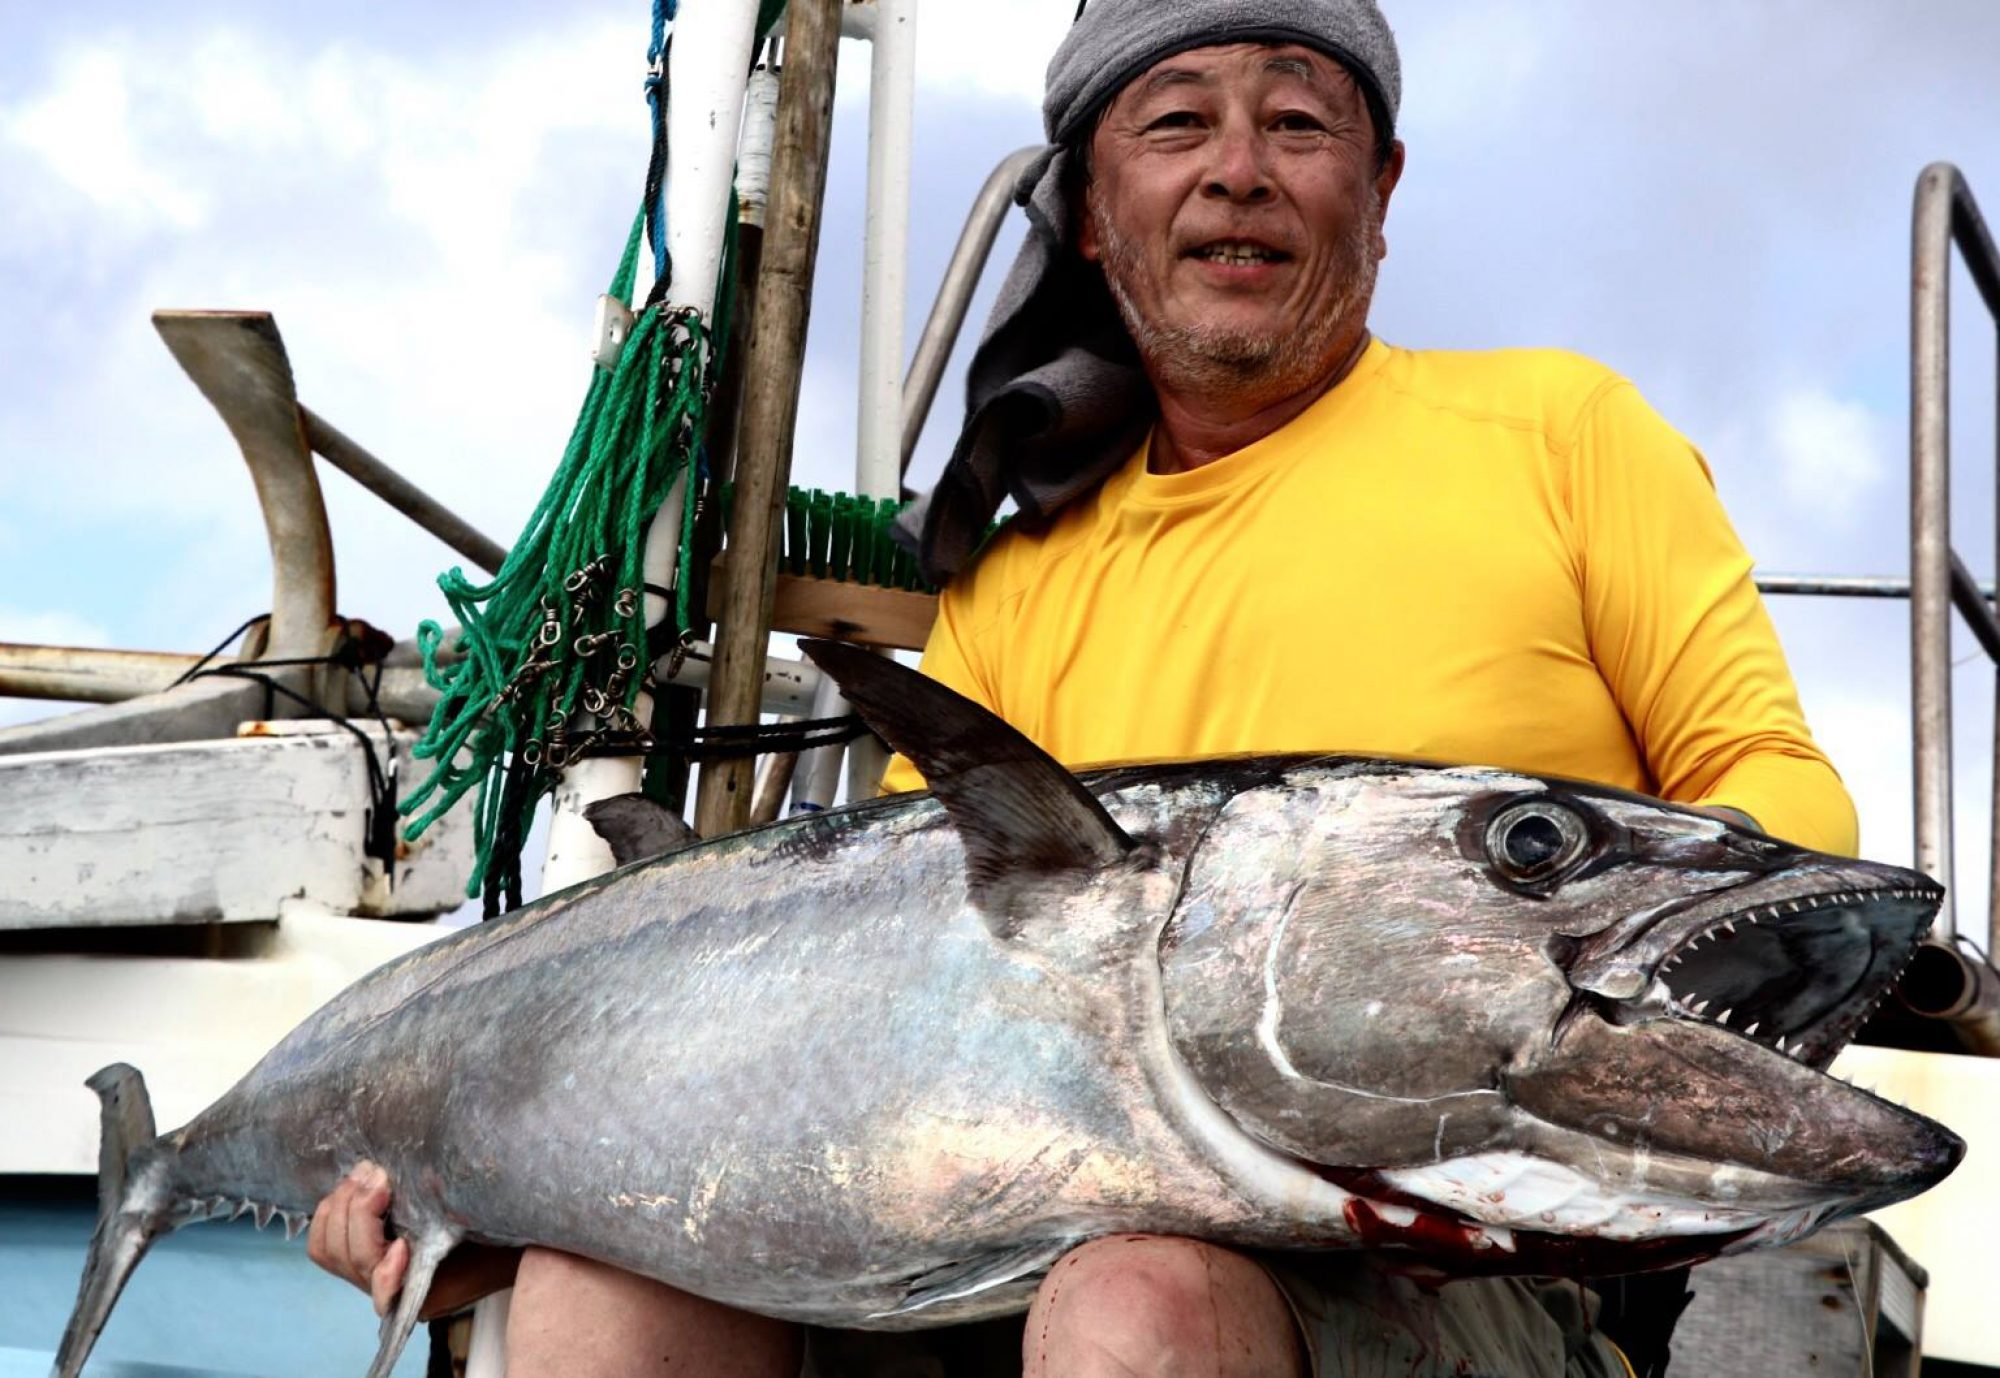 THE EARTHFIELD FISHING